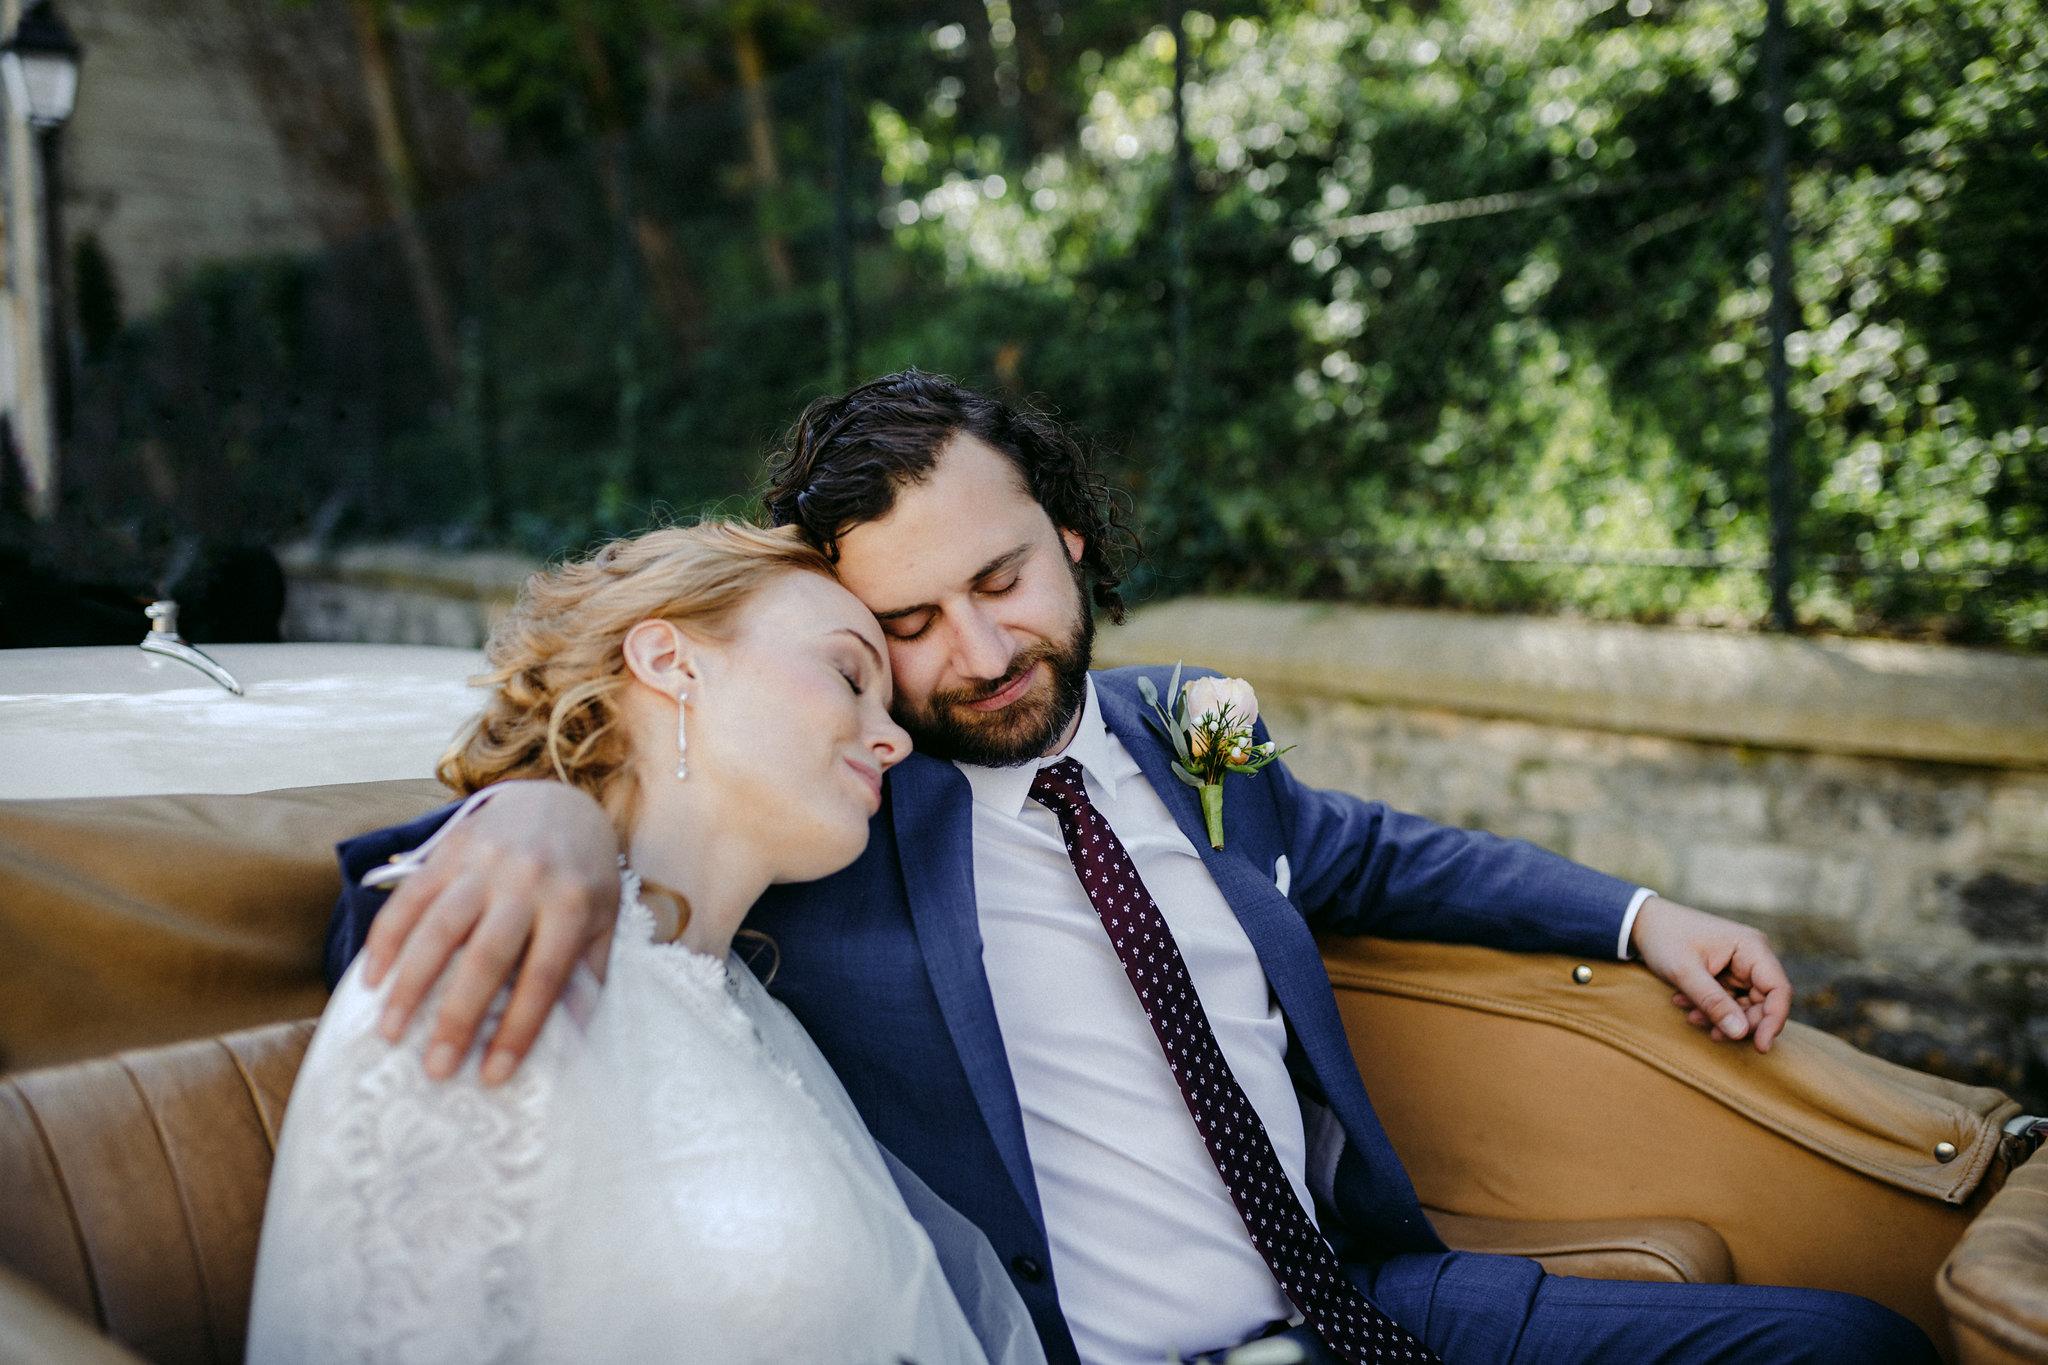 Paris_elopement_wedding_photographer-232.jpg